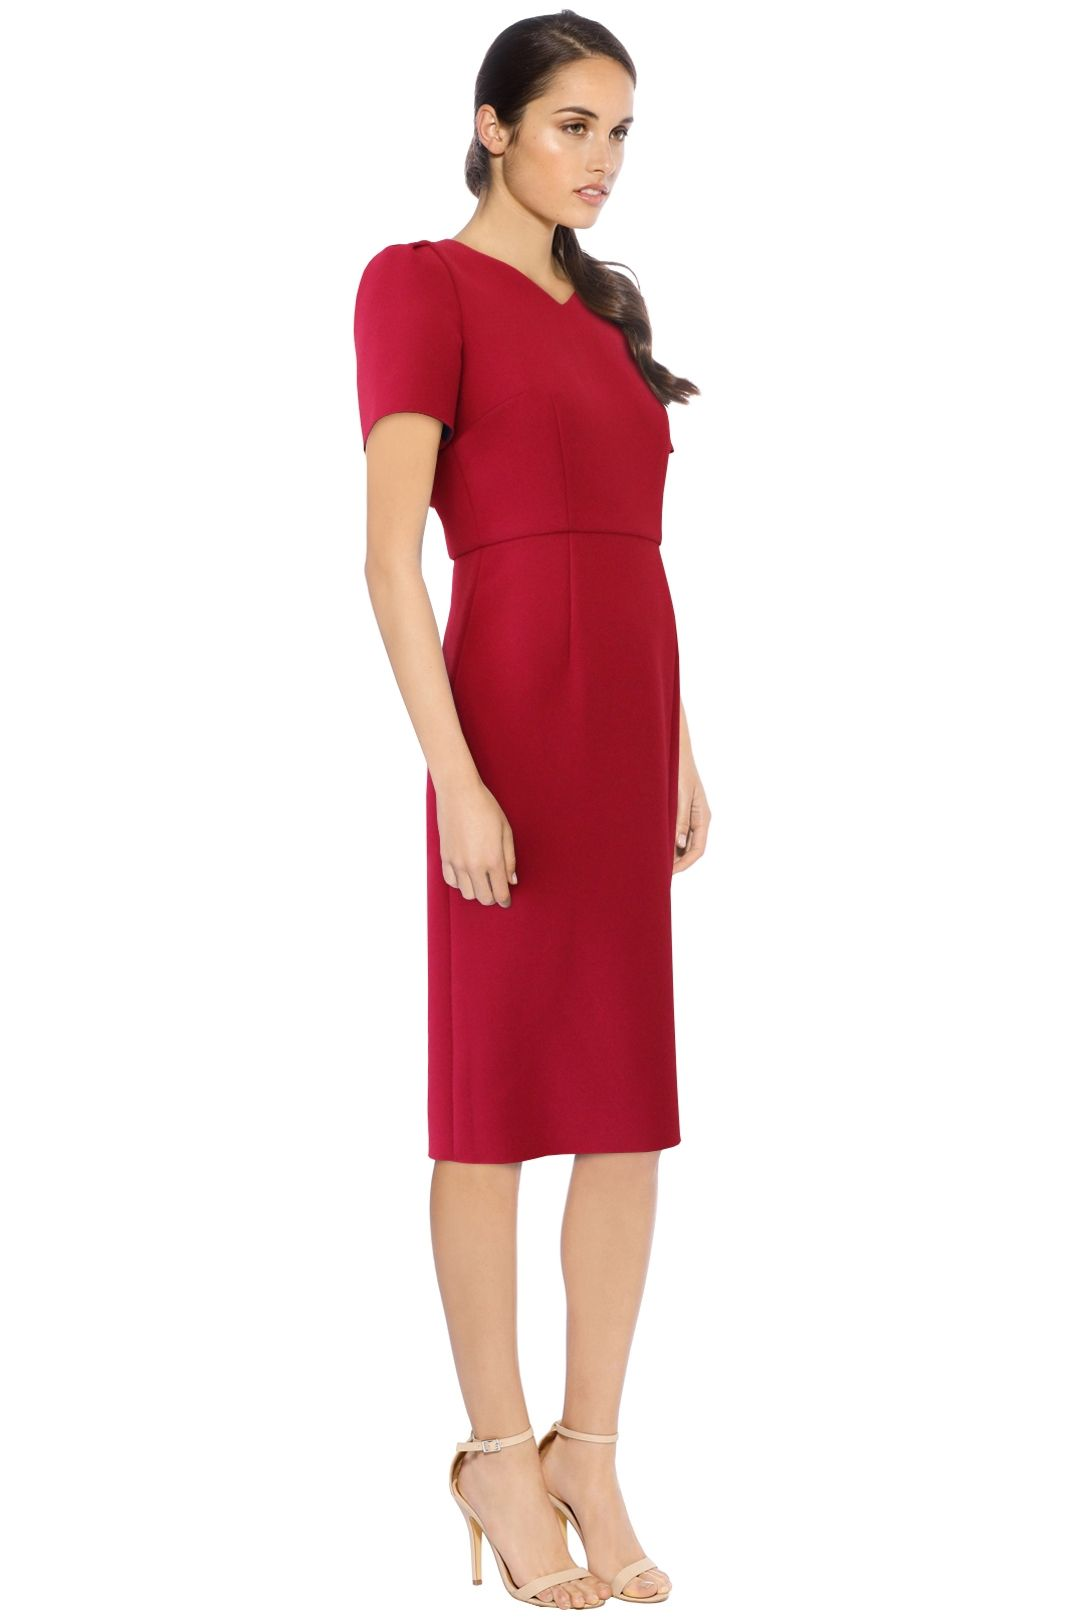 Yeojin Bae - Kristy Dress -Fushcia - Side